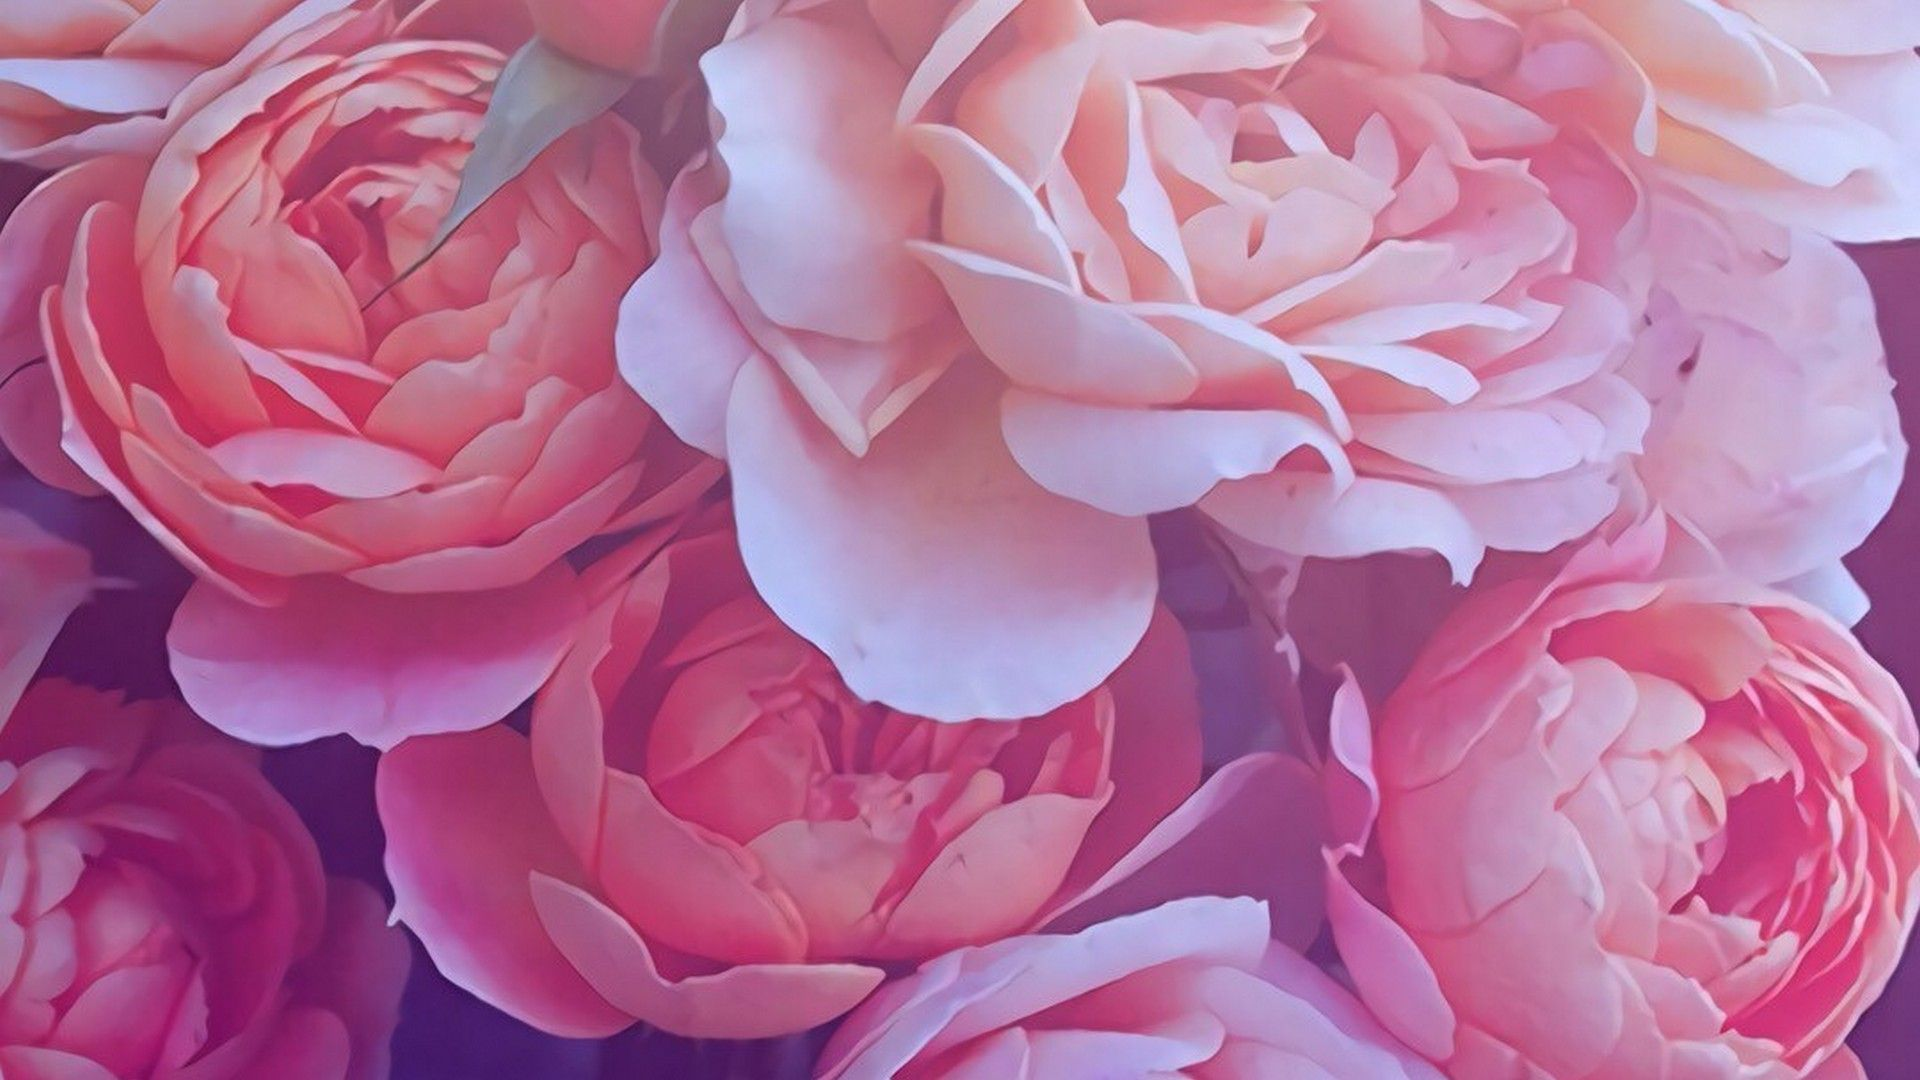 Gold rose desktop backgrounds wallpaper mac wallpaper - Rose desktop wallpaper hd ...